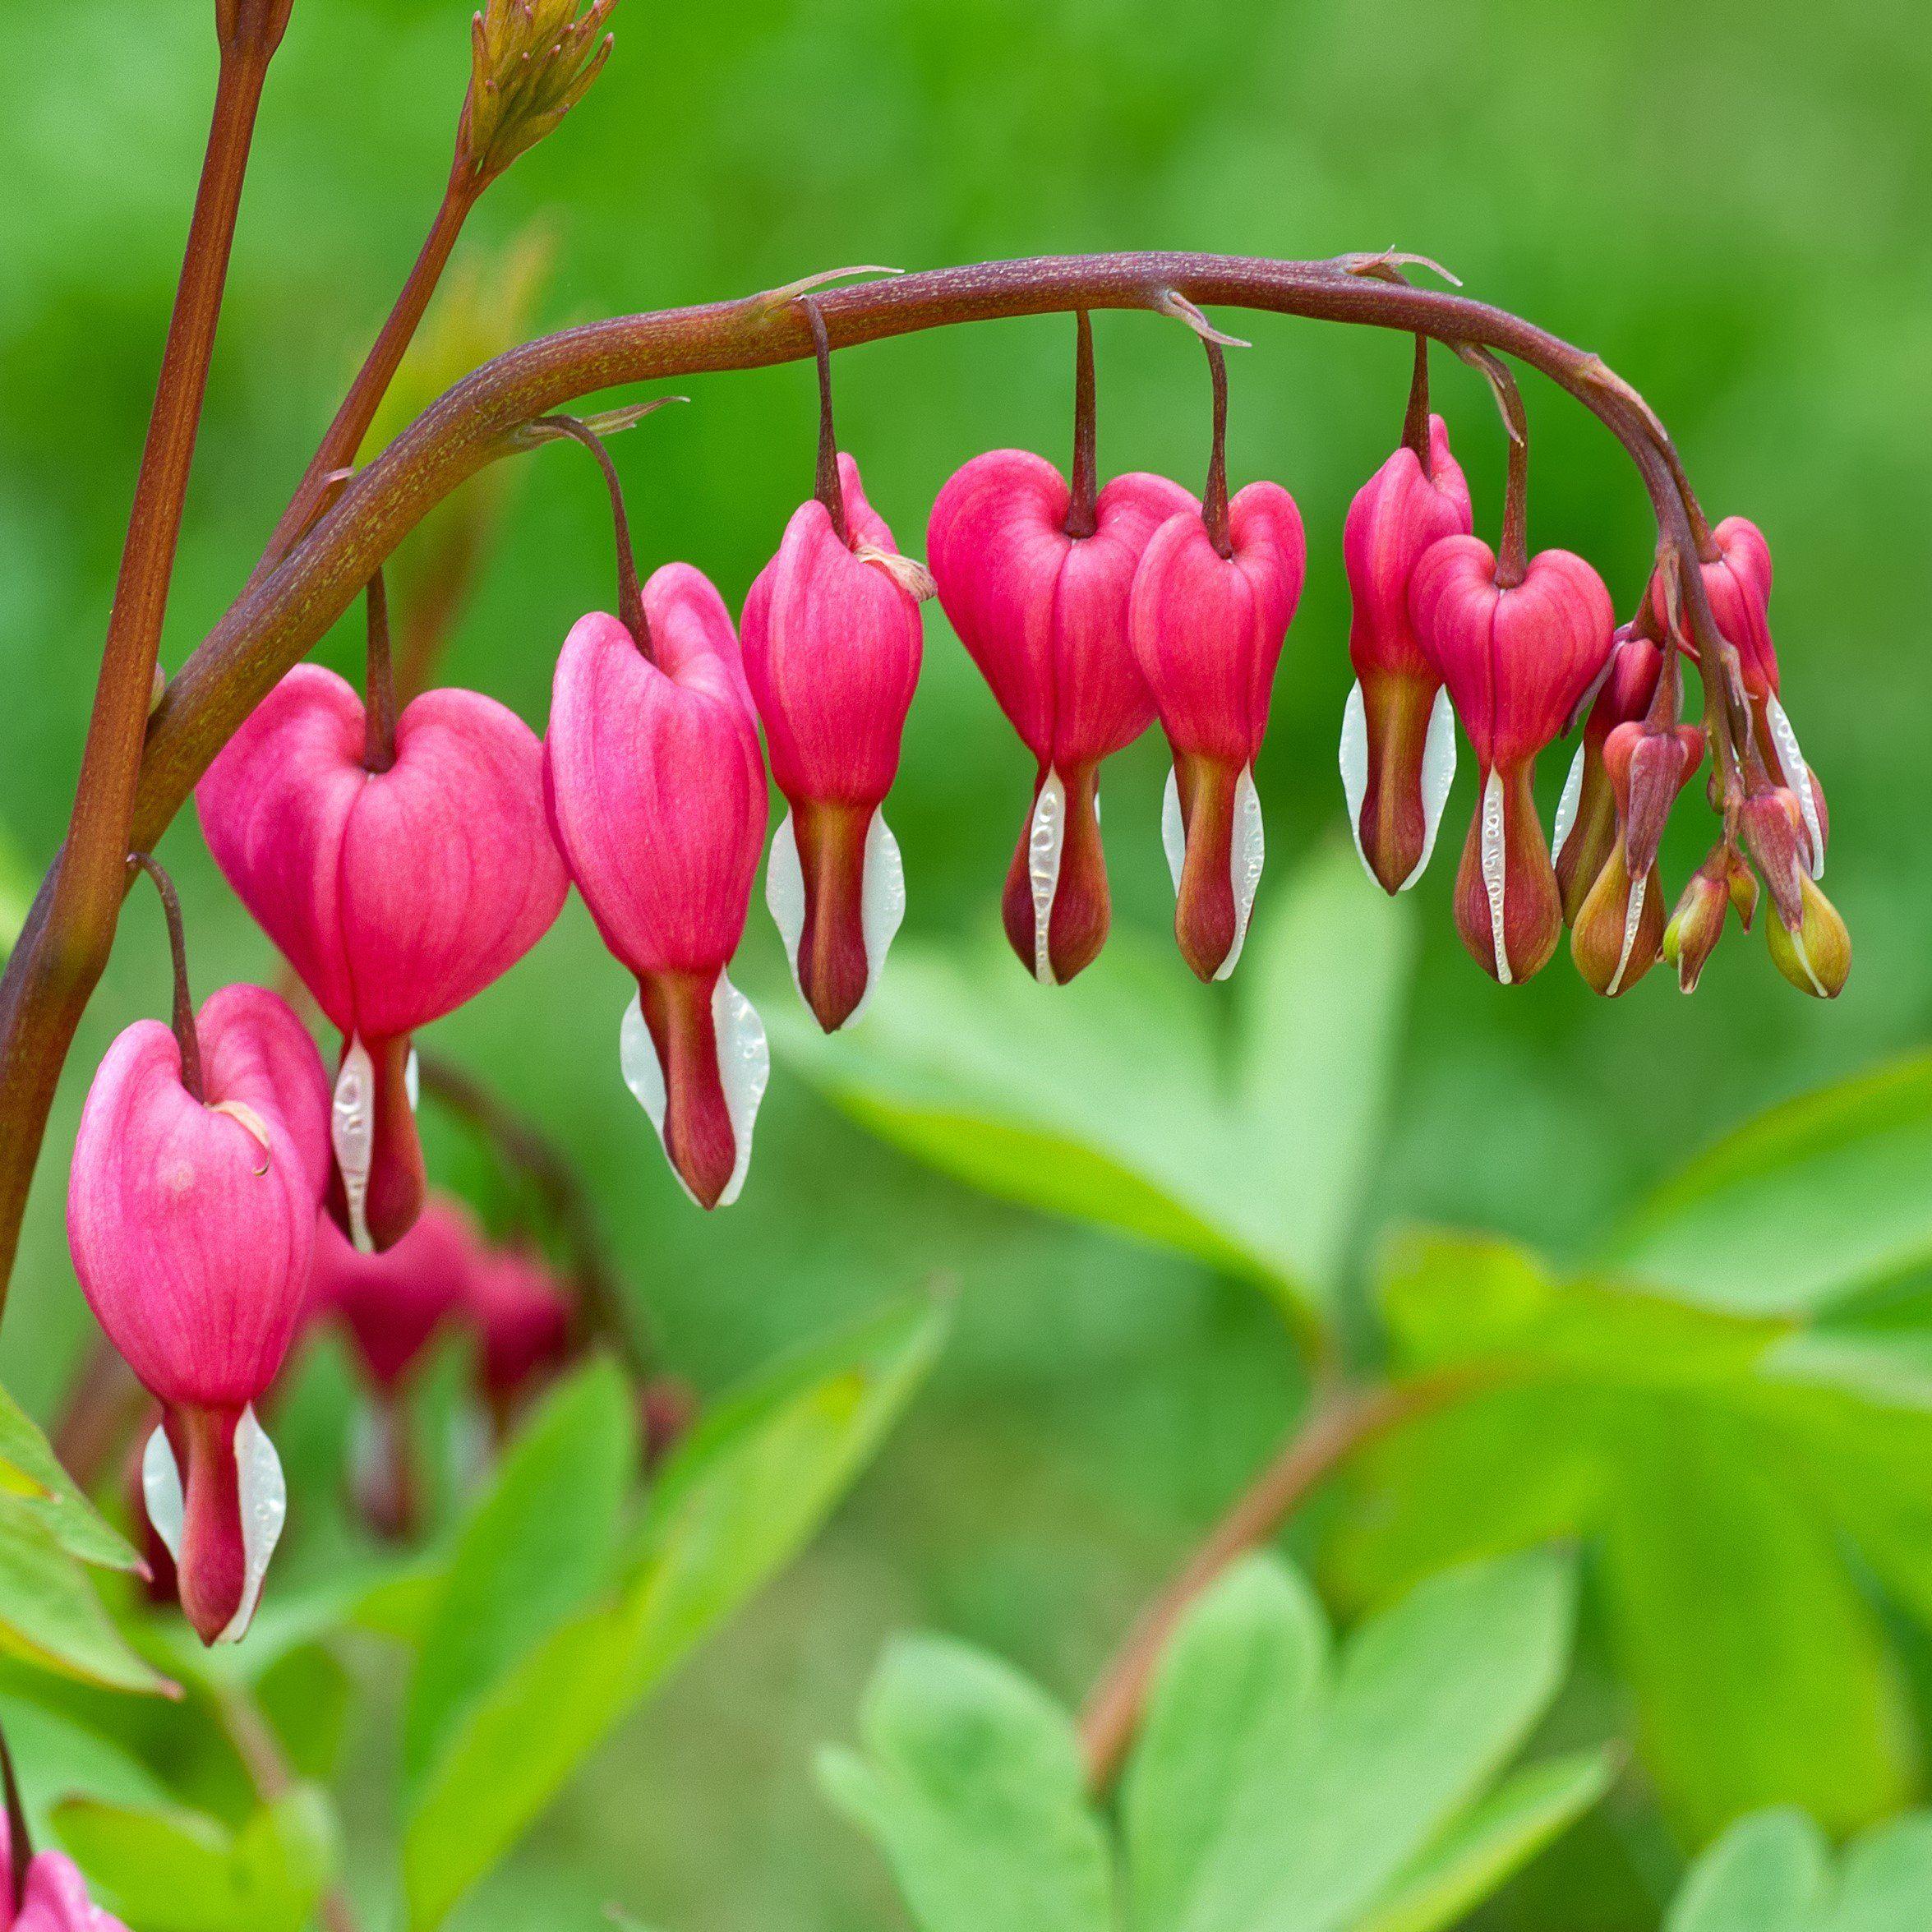 Allium Ampeloprasum Bleeding Heart Easy To Grow Bulbs Beautiful Pink Flowers